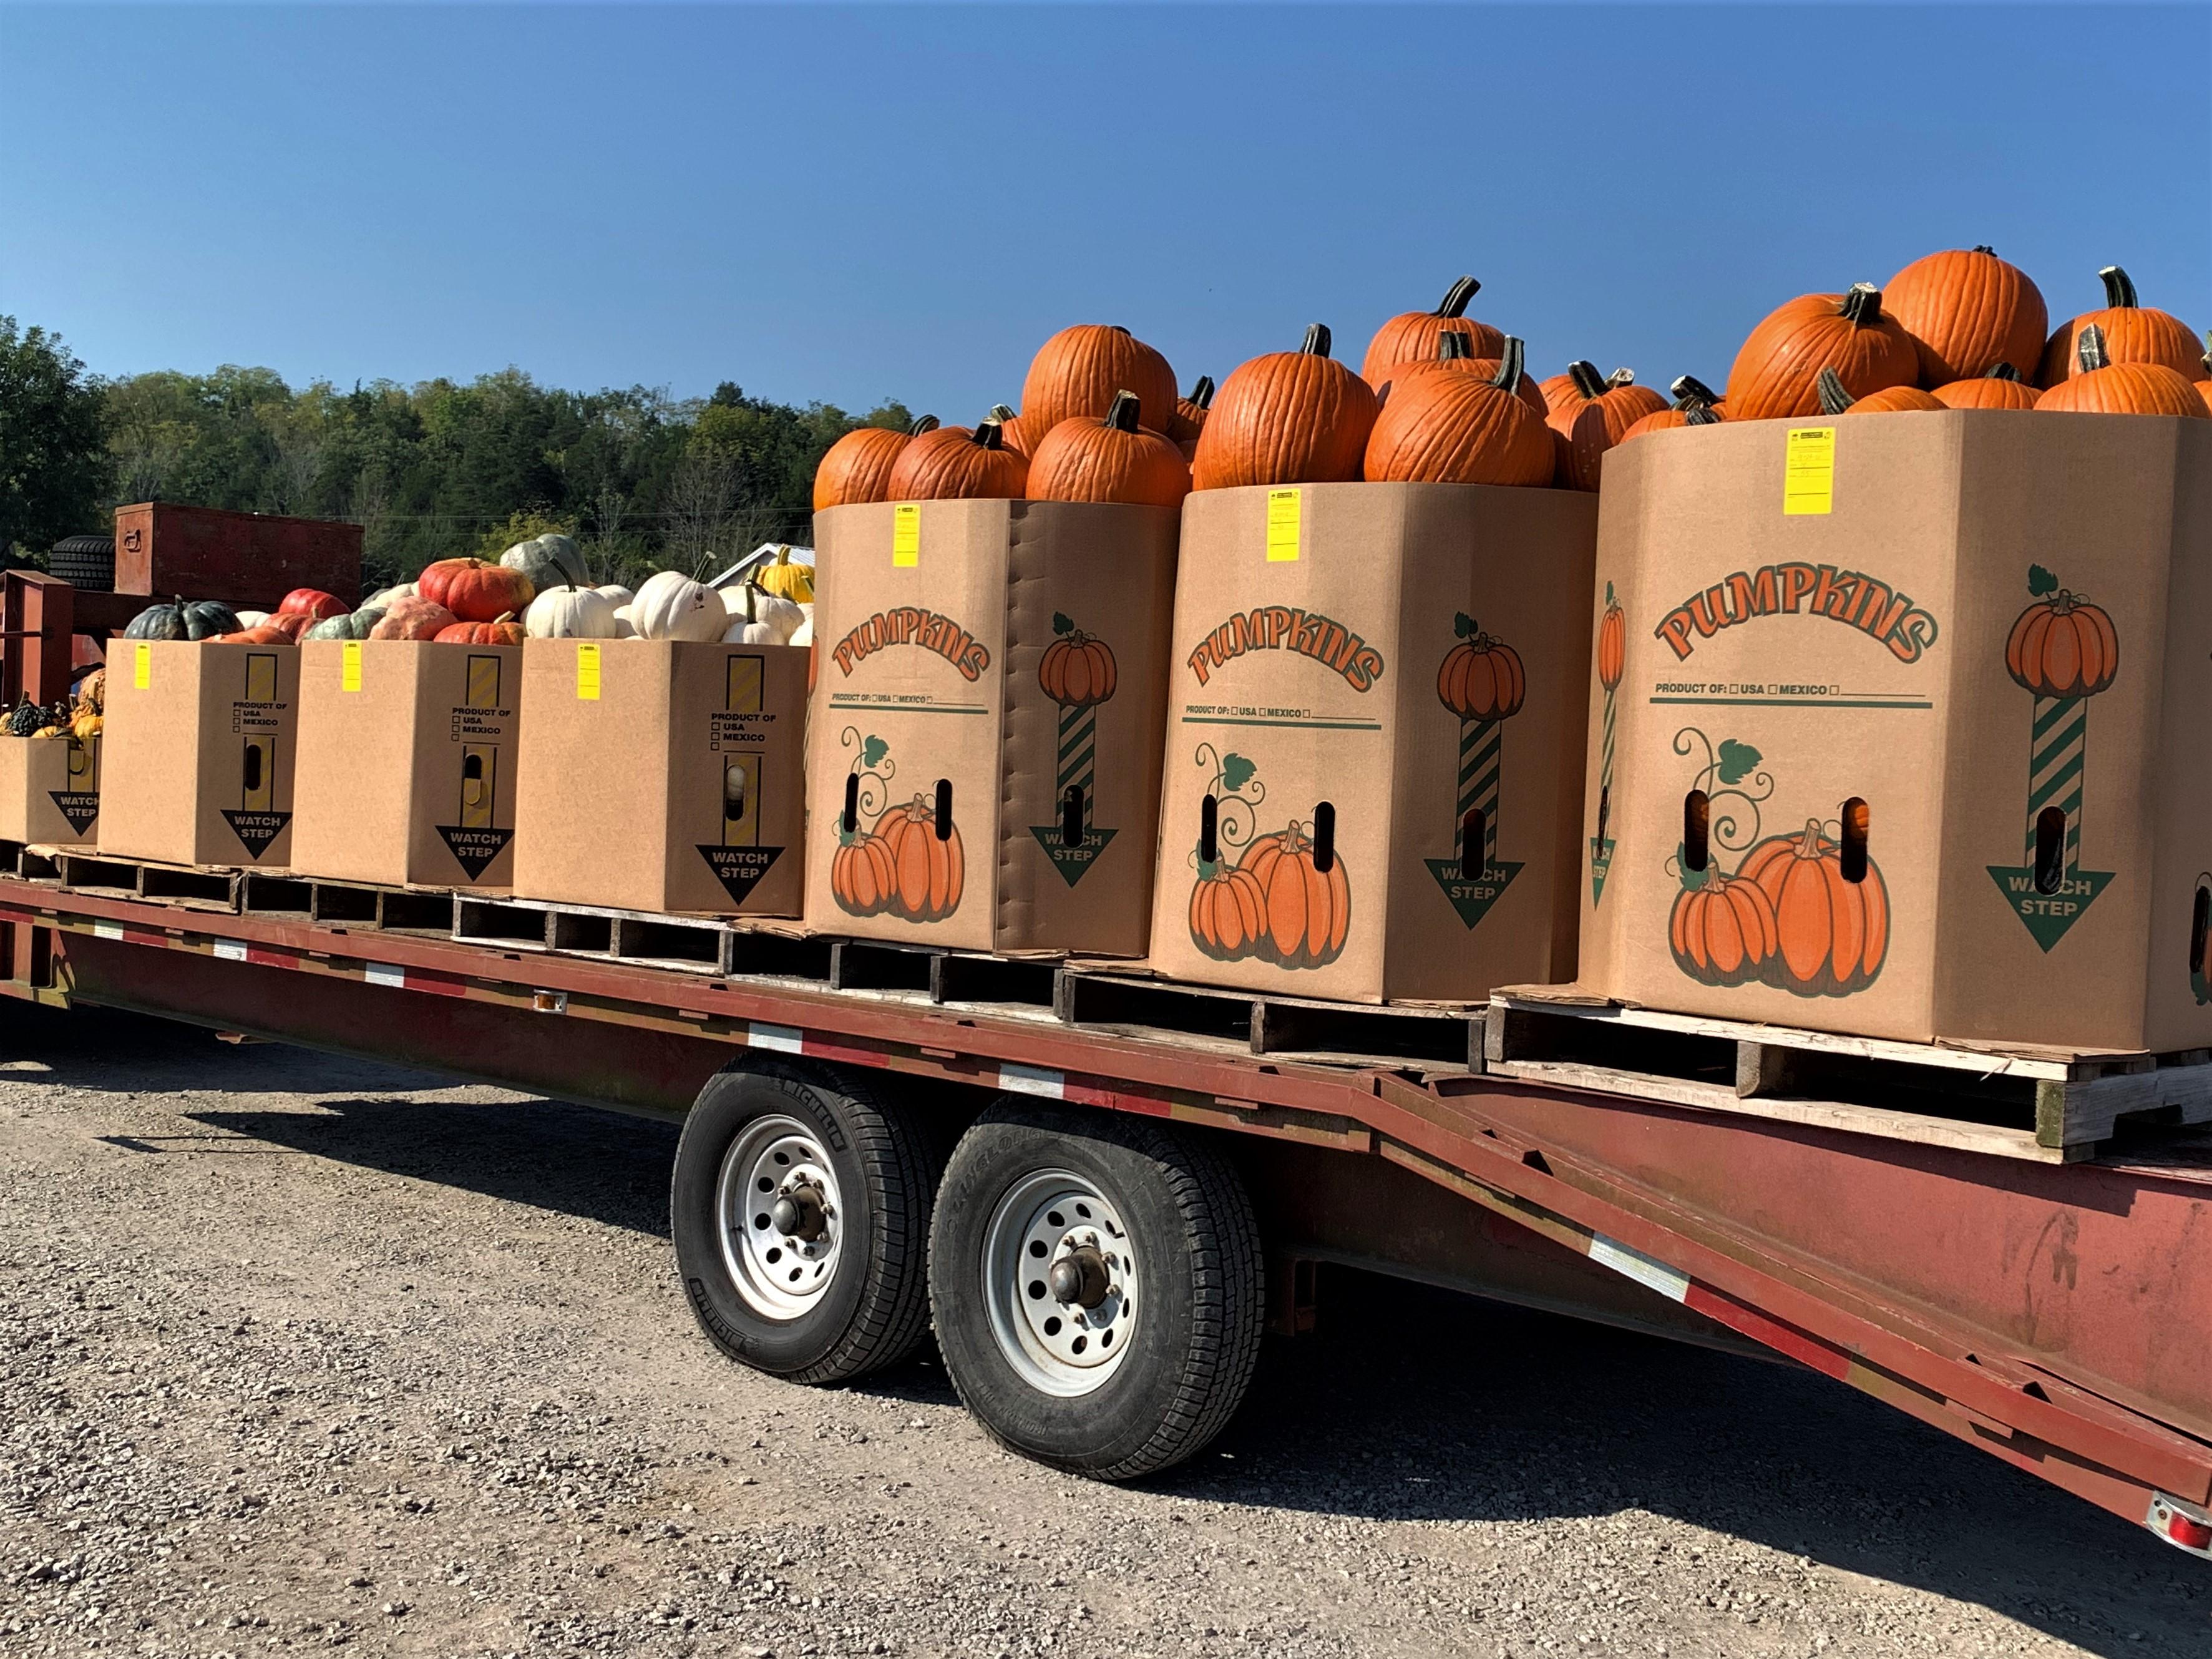 Boxed by size, pumpkins await bidding at Crab Orchard, Kentucky